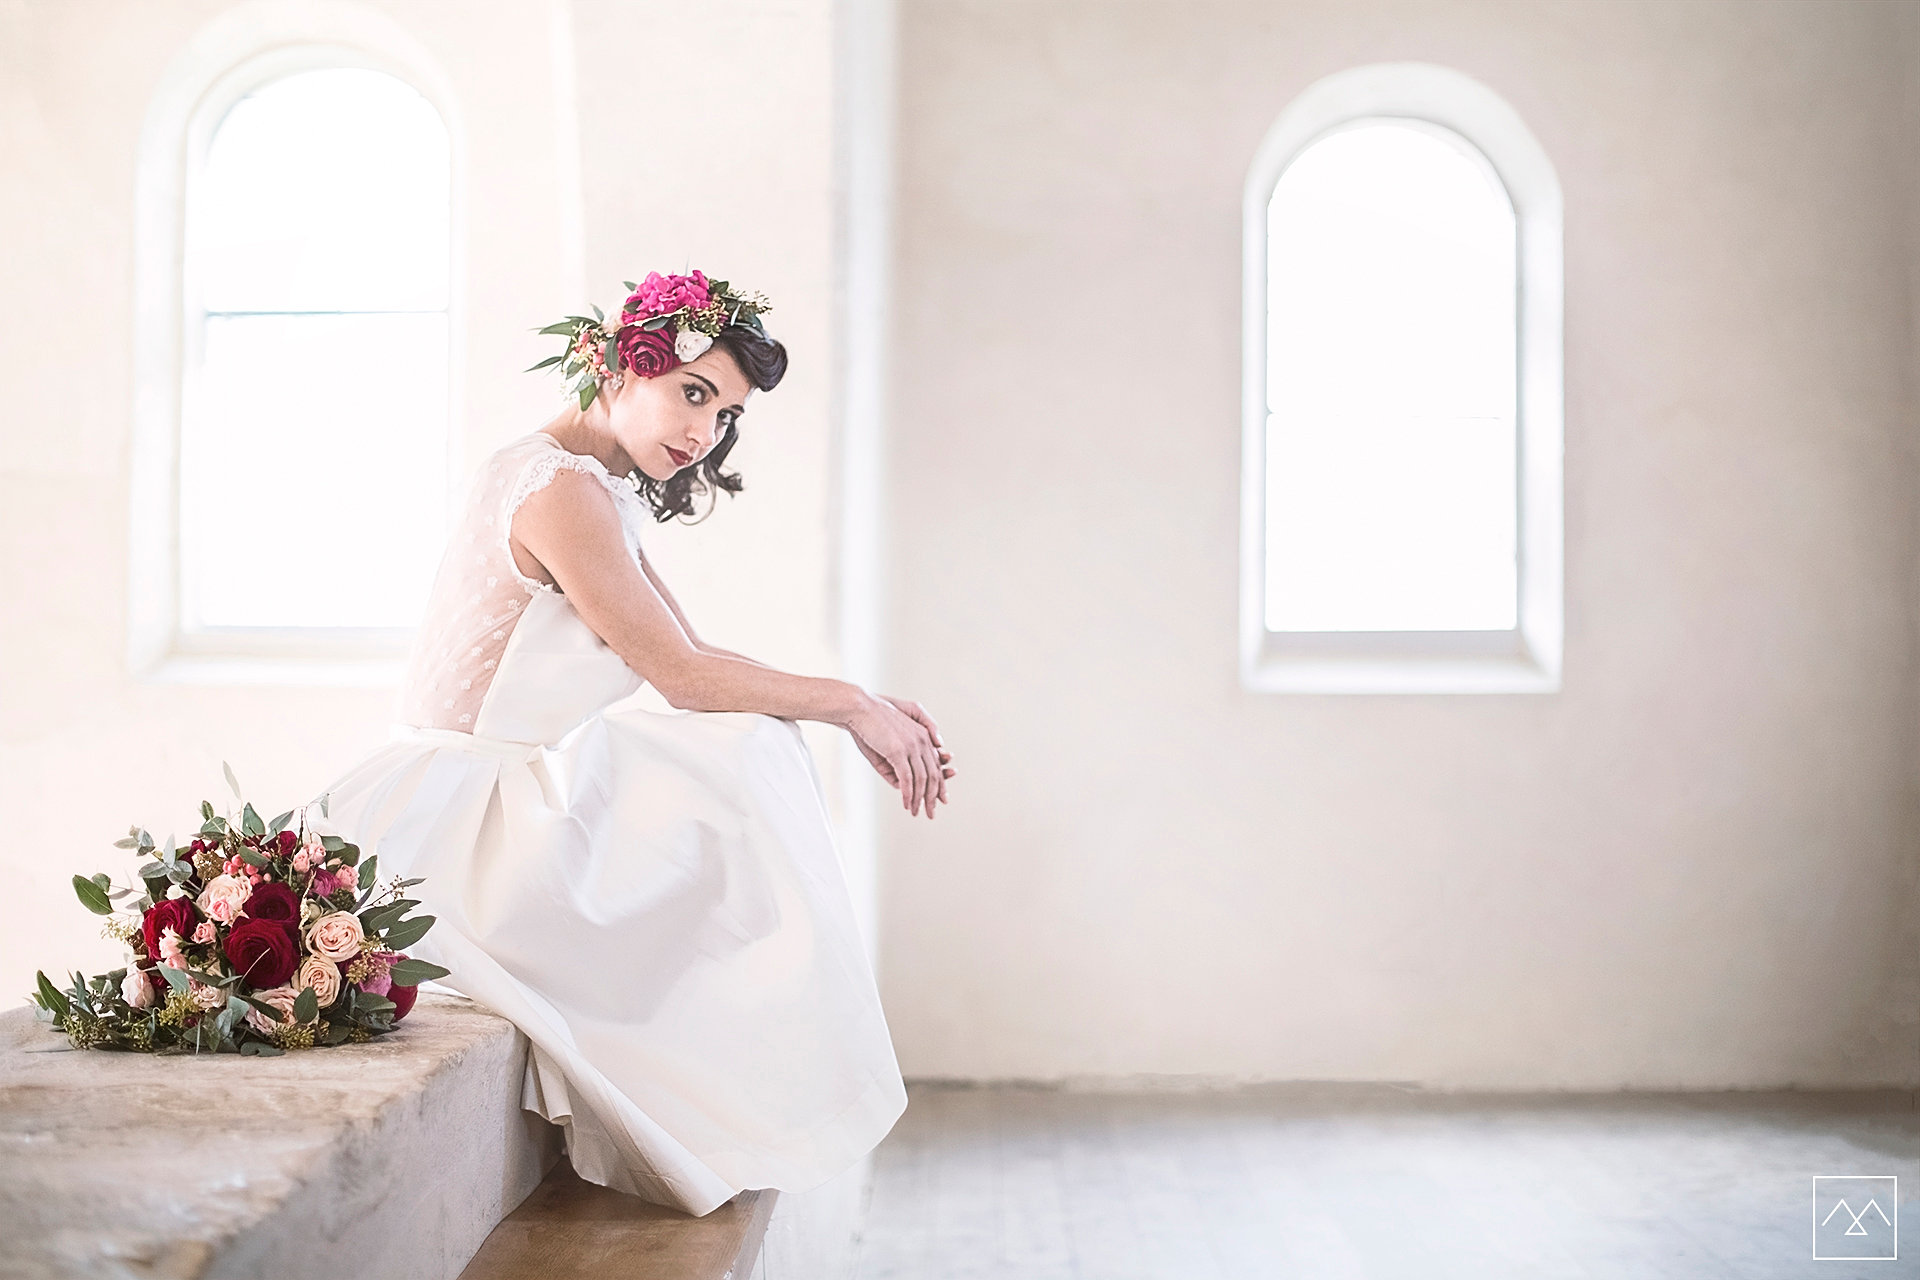 maquillage coiffure lyon 11 anna cruz maquillage et coiffure mariage lyon shooting inspiration collection 2017 - Coiffeuse Maquilleuse Mariage Lyon